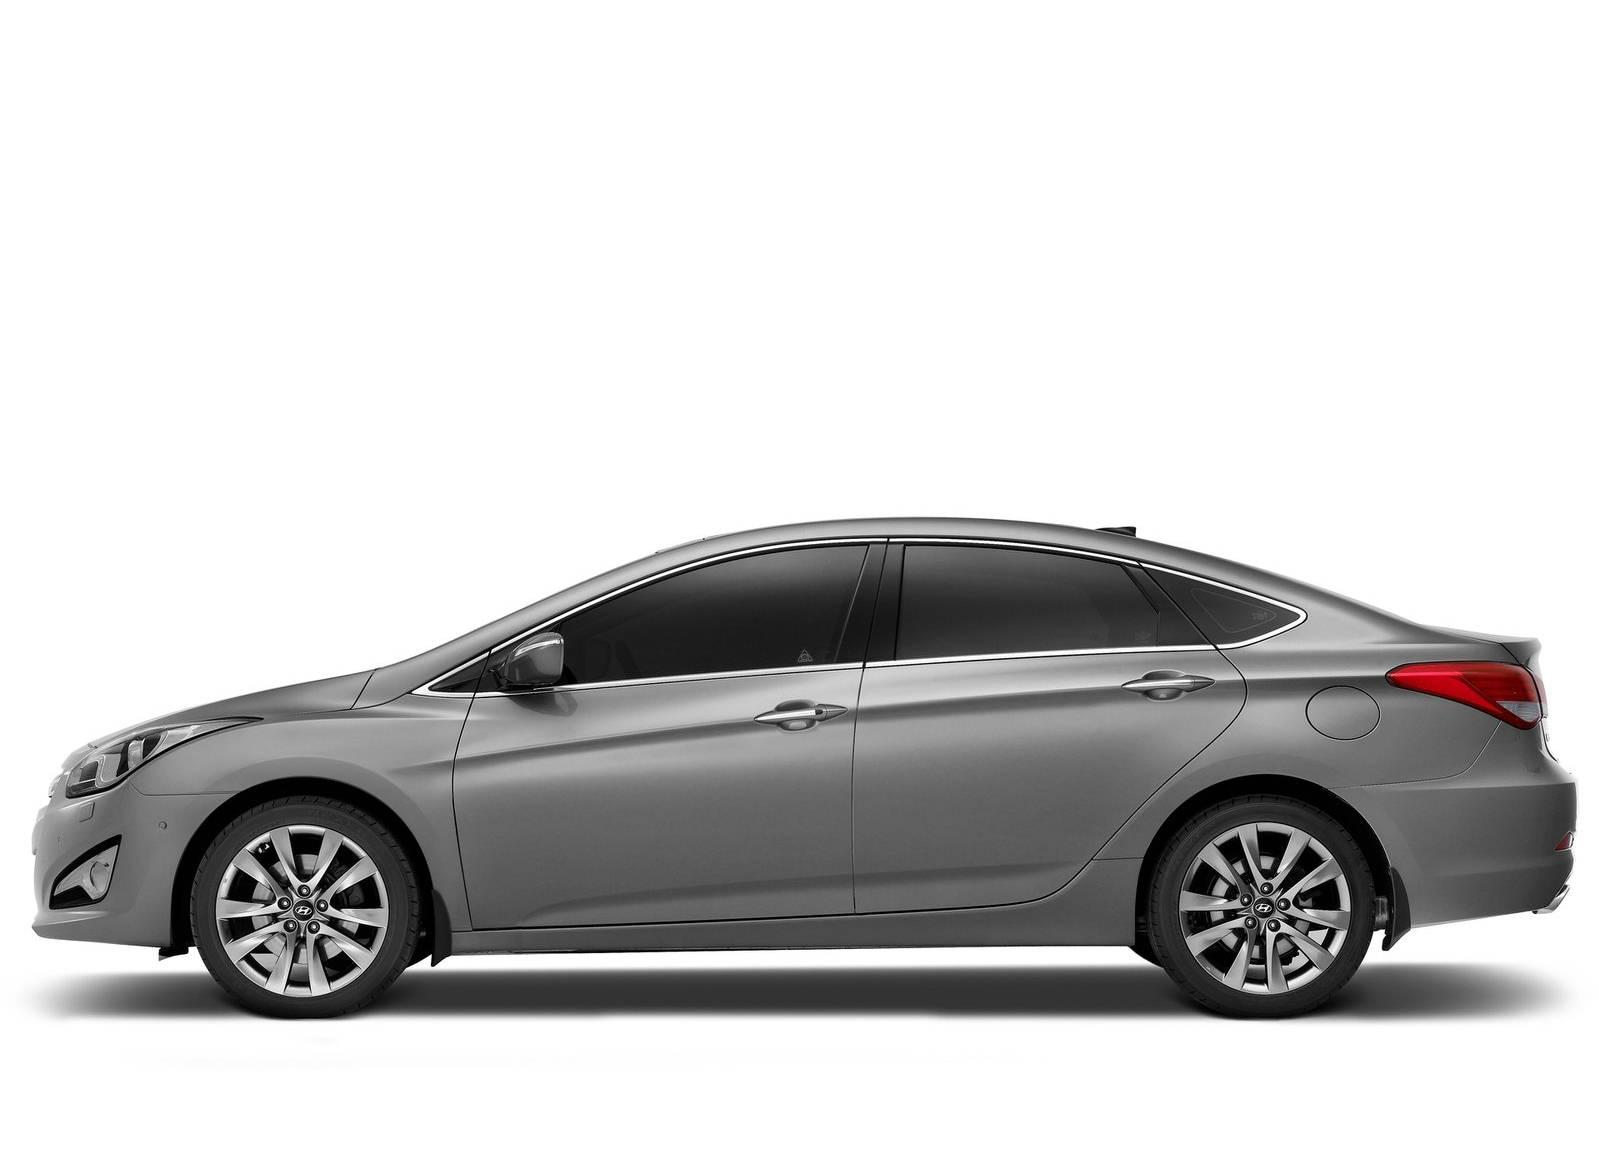 http://1.bp.blogspot.com/--9-TCqYCgto/TdNIMpwn8cI/AAAAAAAADOo/Rf0QVs9t1jk/s1600/Hyundai+i40+Car+3.jpg